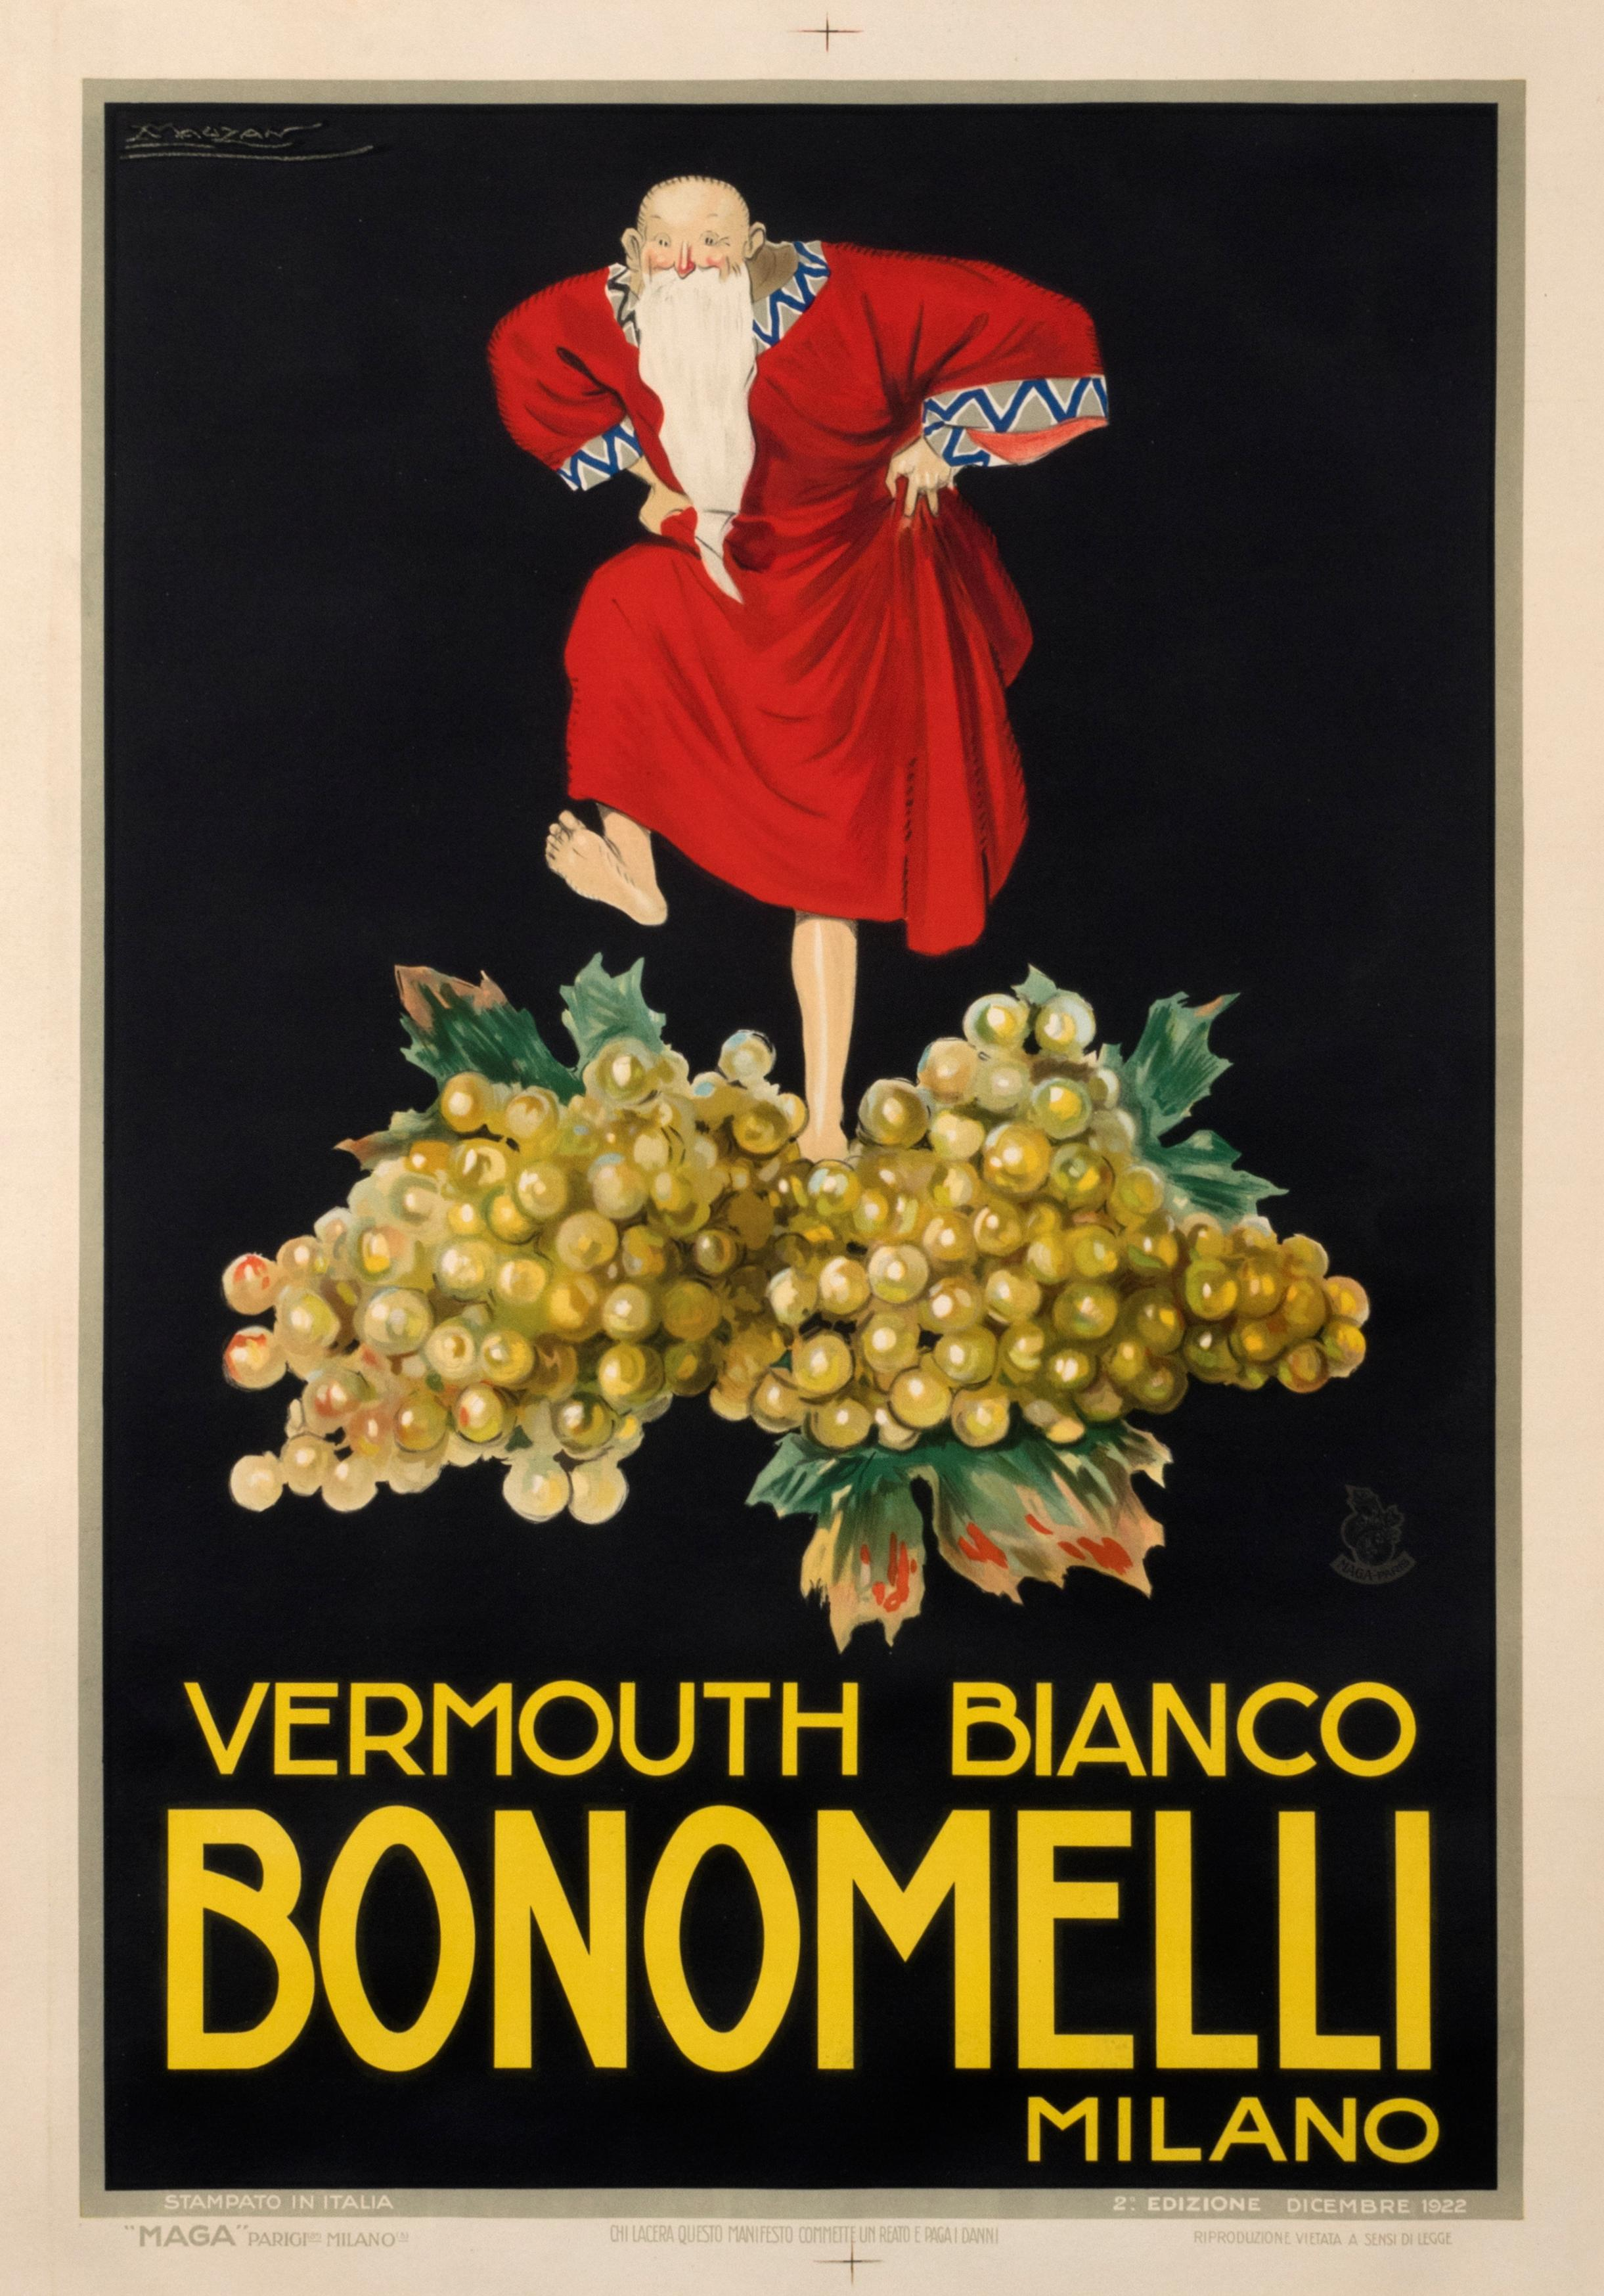 Bonomelli Vermouth Bianco original vintage aperitif poster